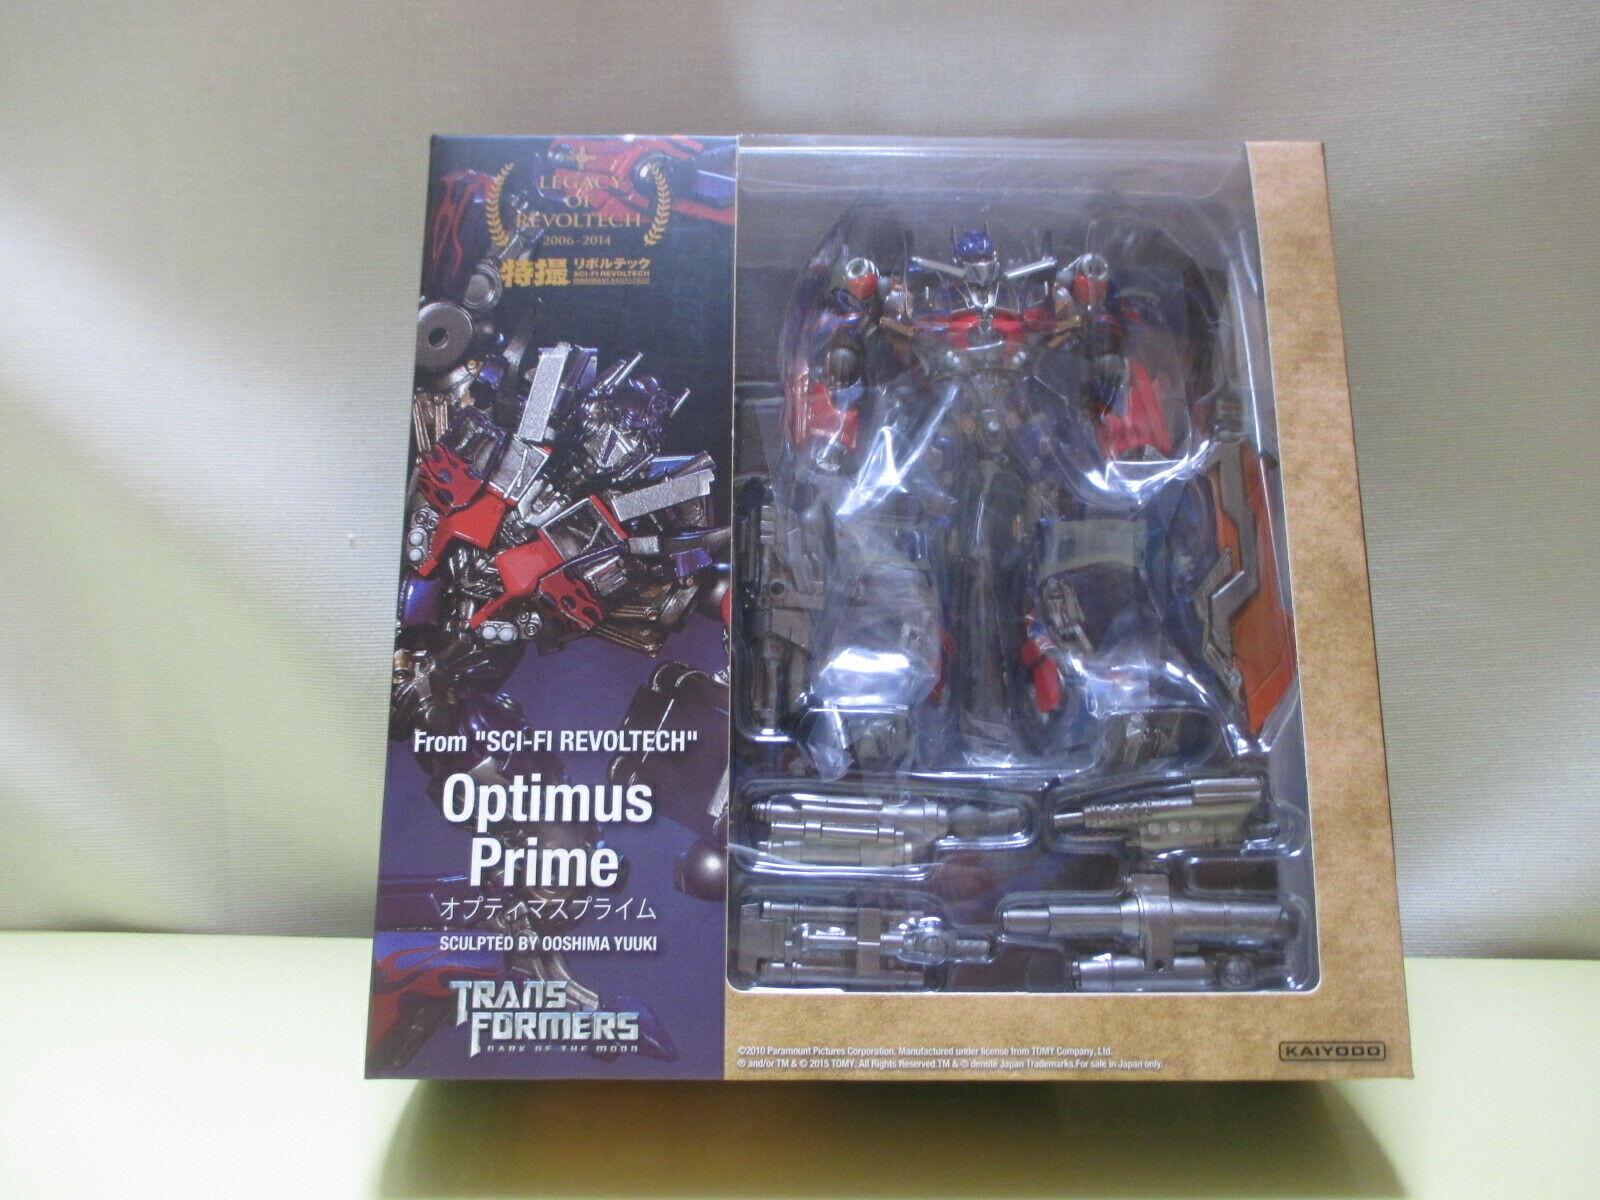 Kaiyodo Legacy of Revoltech Lr 049 Transformers Optimus Prime 1600x1200